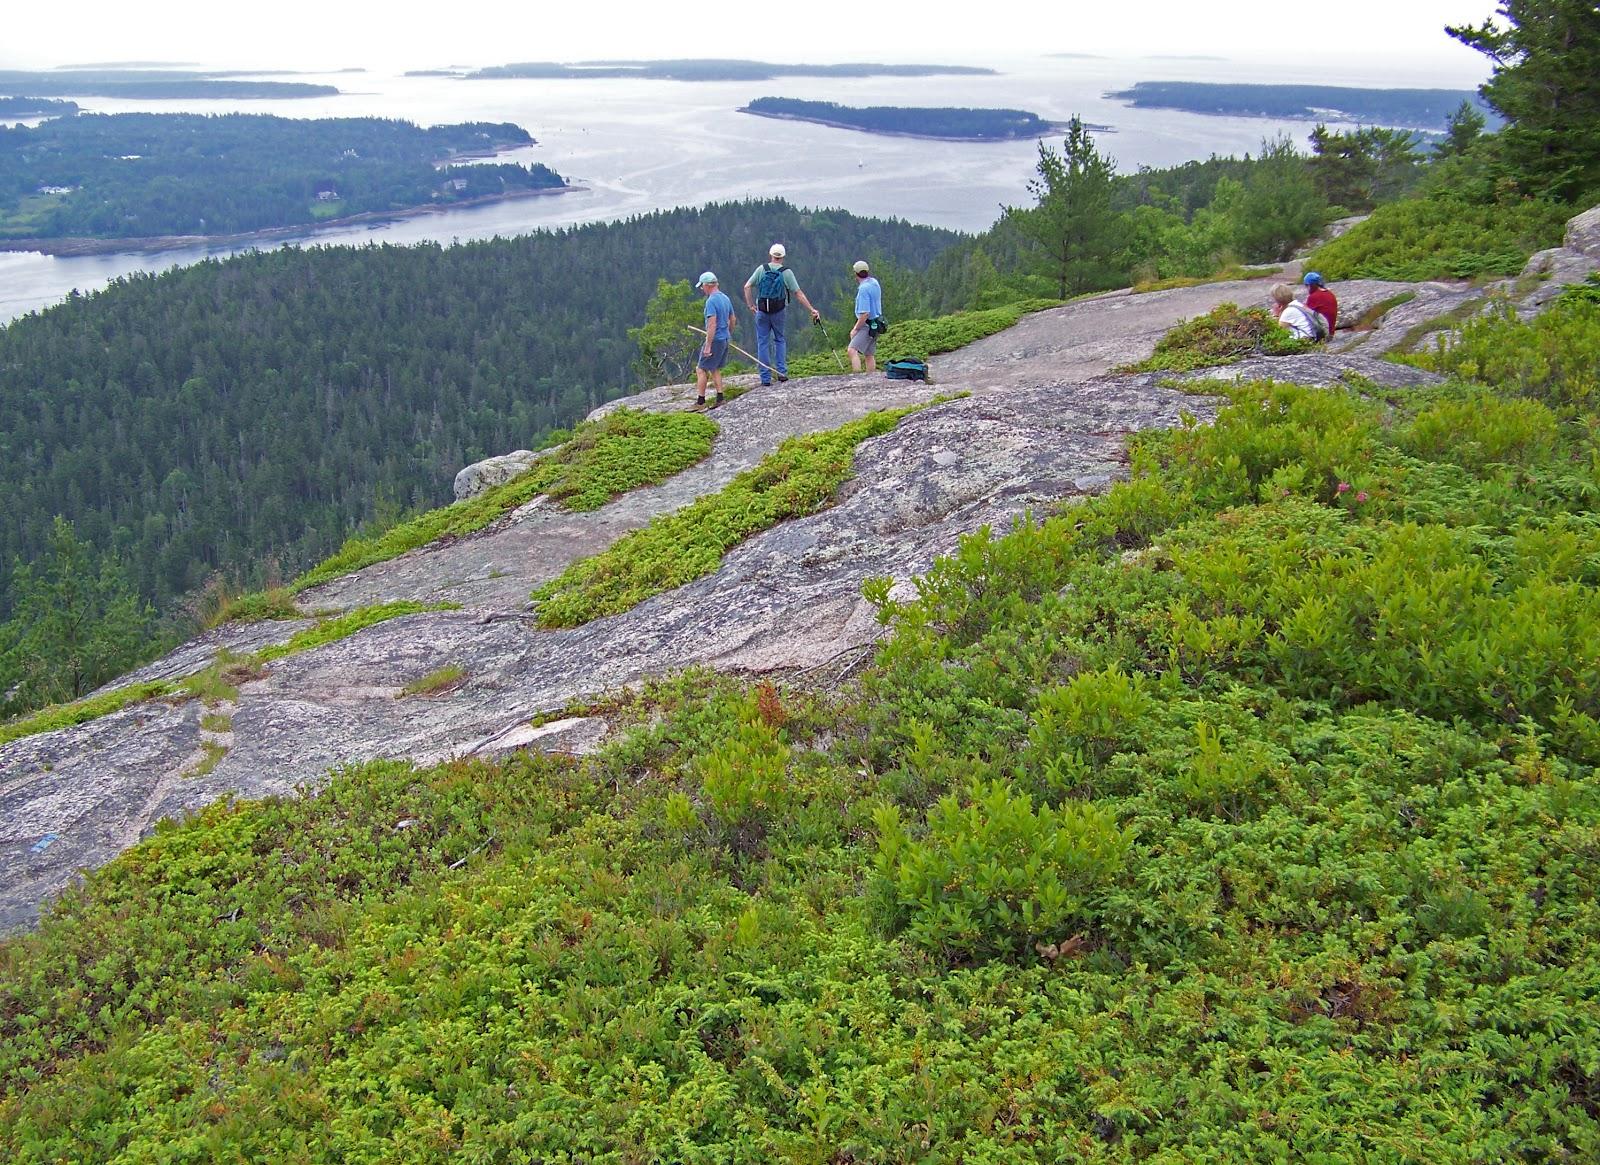 The Memorials of Acadia National Park: 2012